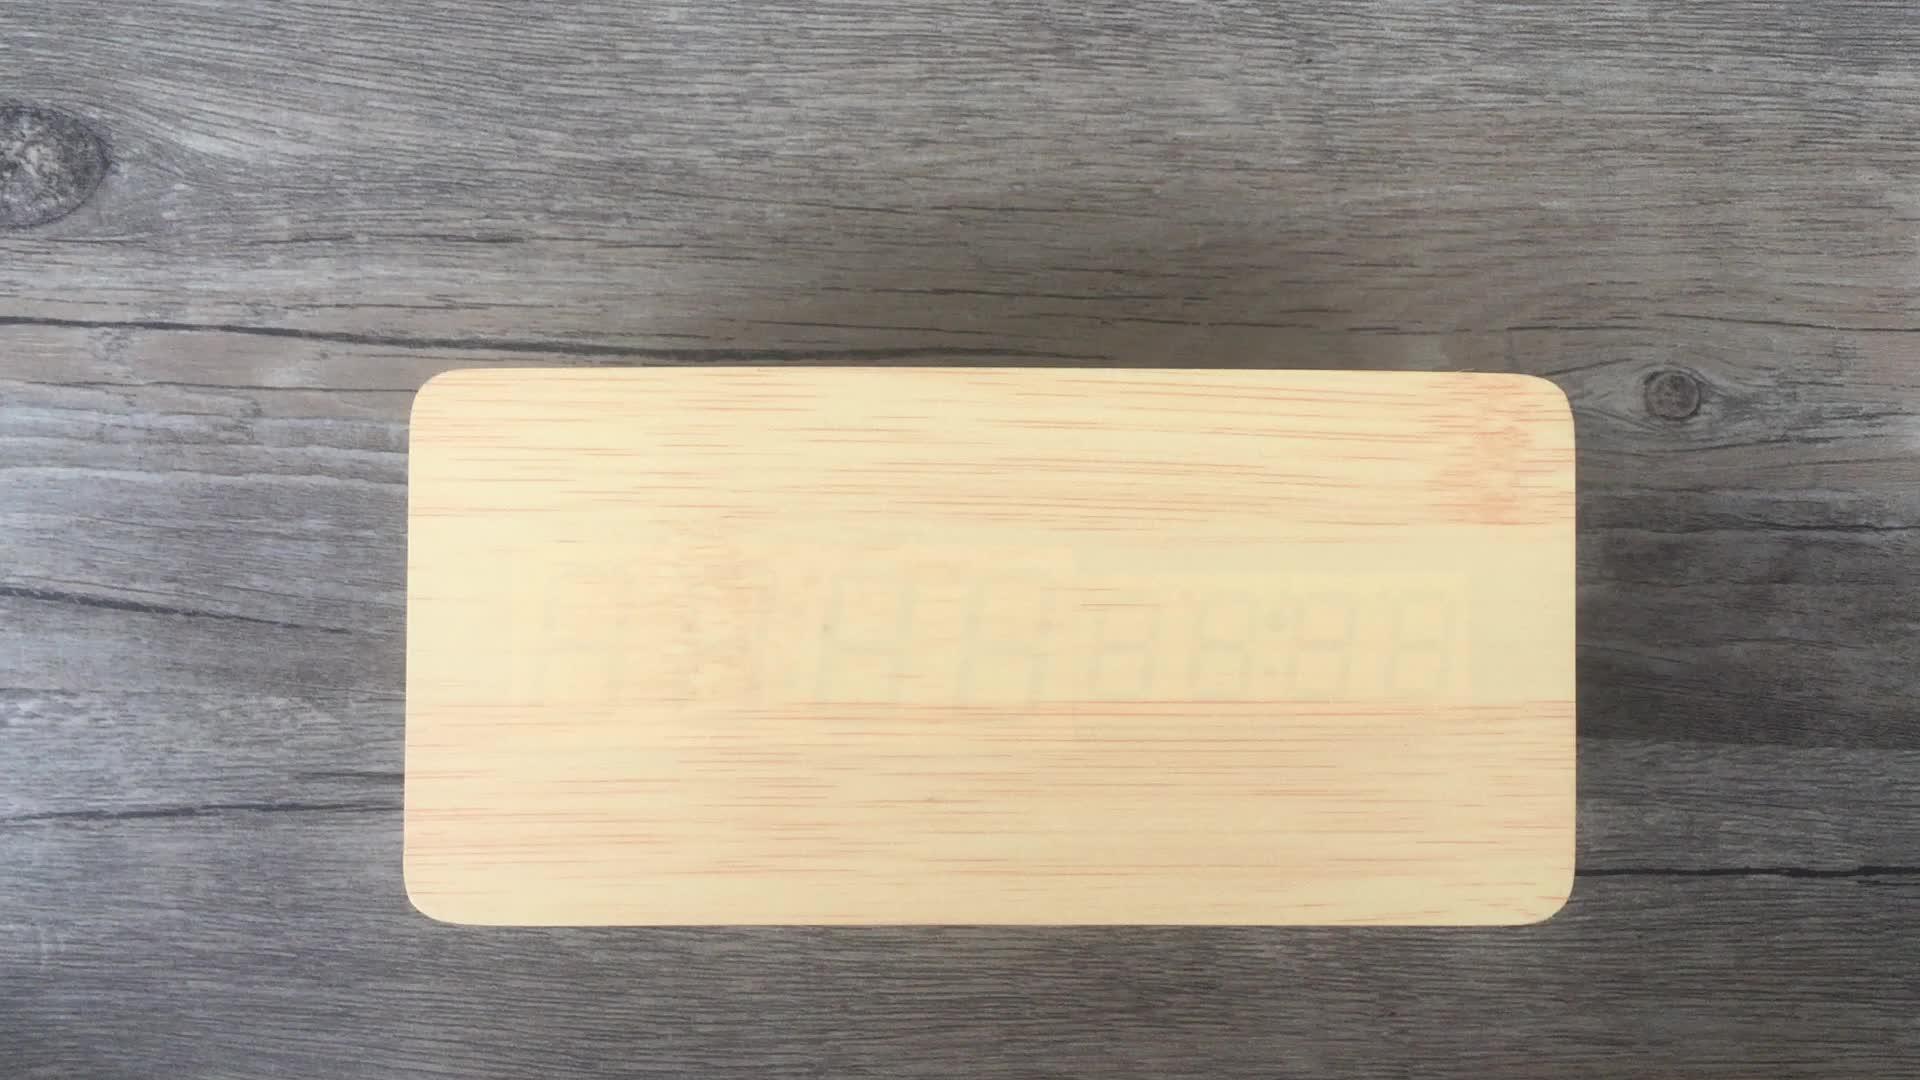 Goedkope bulk kerstcadeaus nieuwe hout digitale LED klok